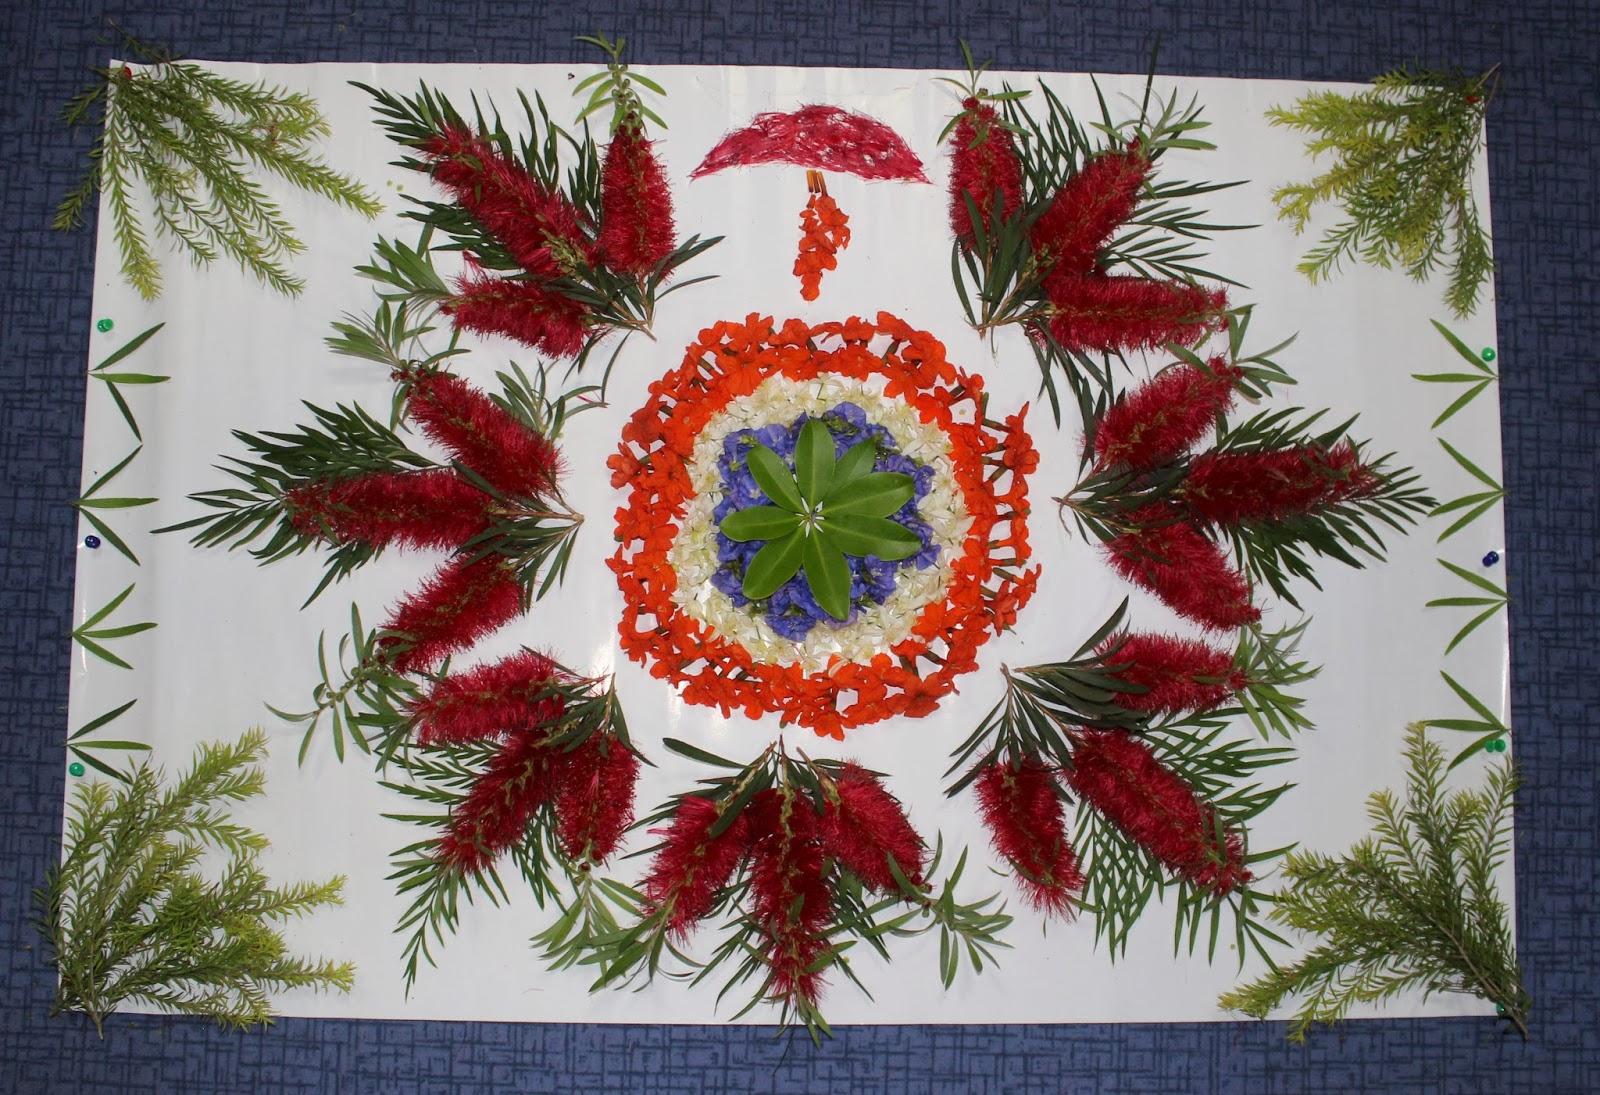 Flower Rangoli Designs for Diwali 2017 - Best Floral Rangoli ... for Flower Rangoli Designs For Diwali  174mzq